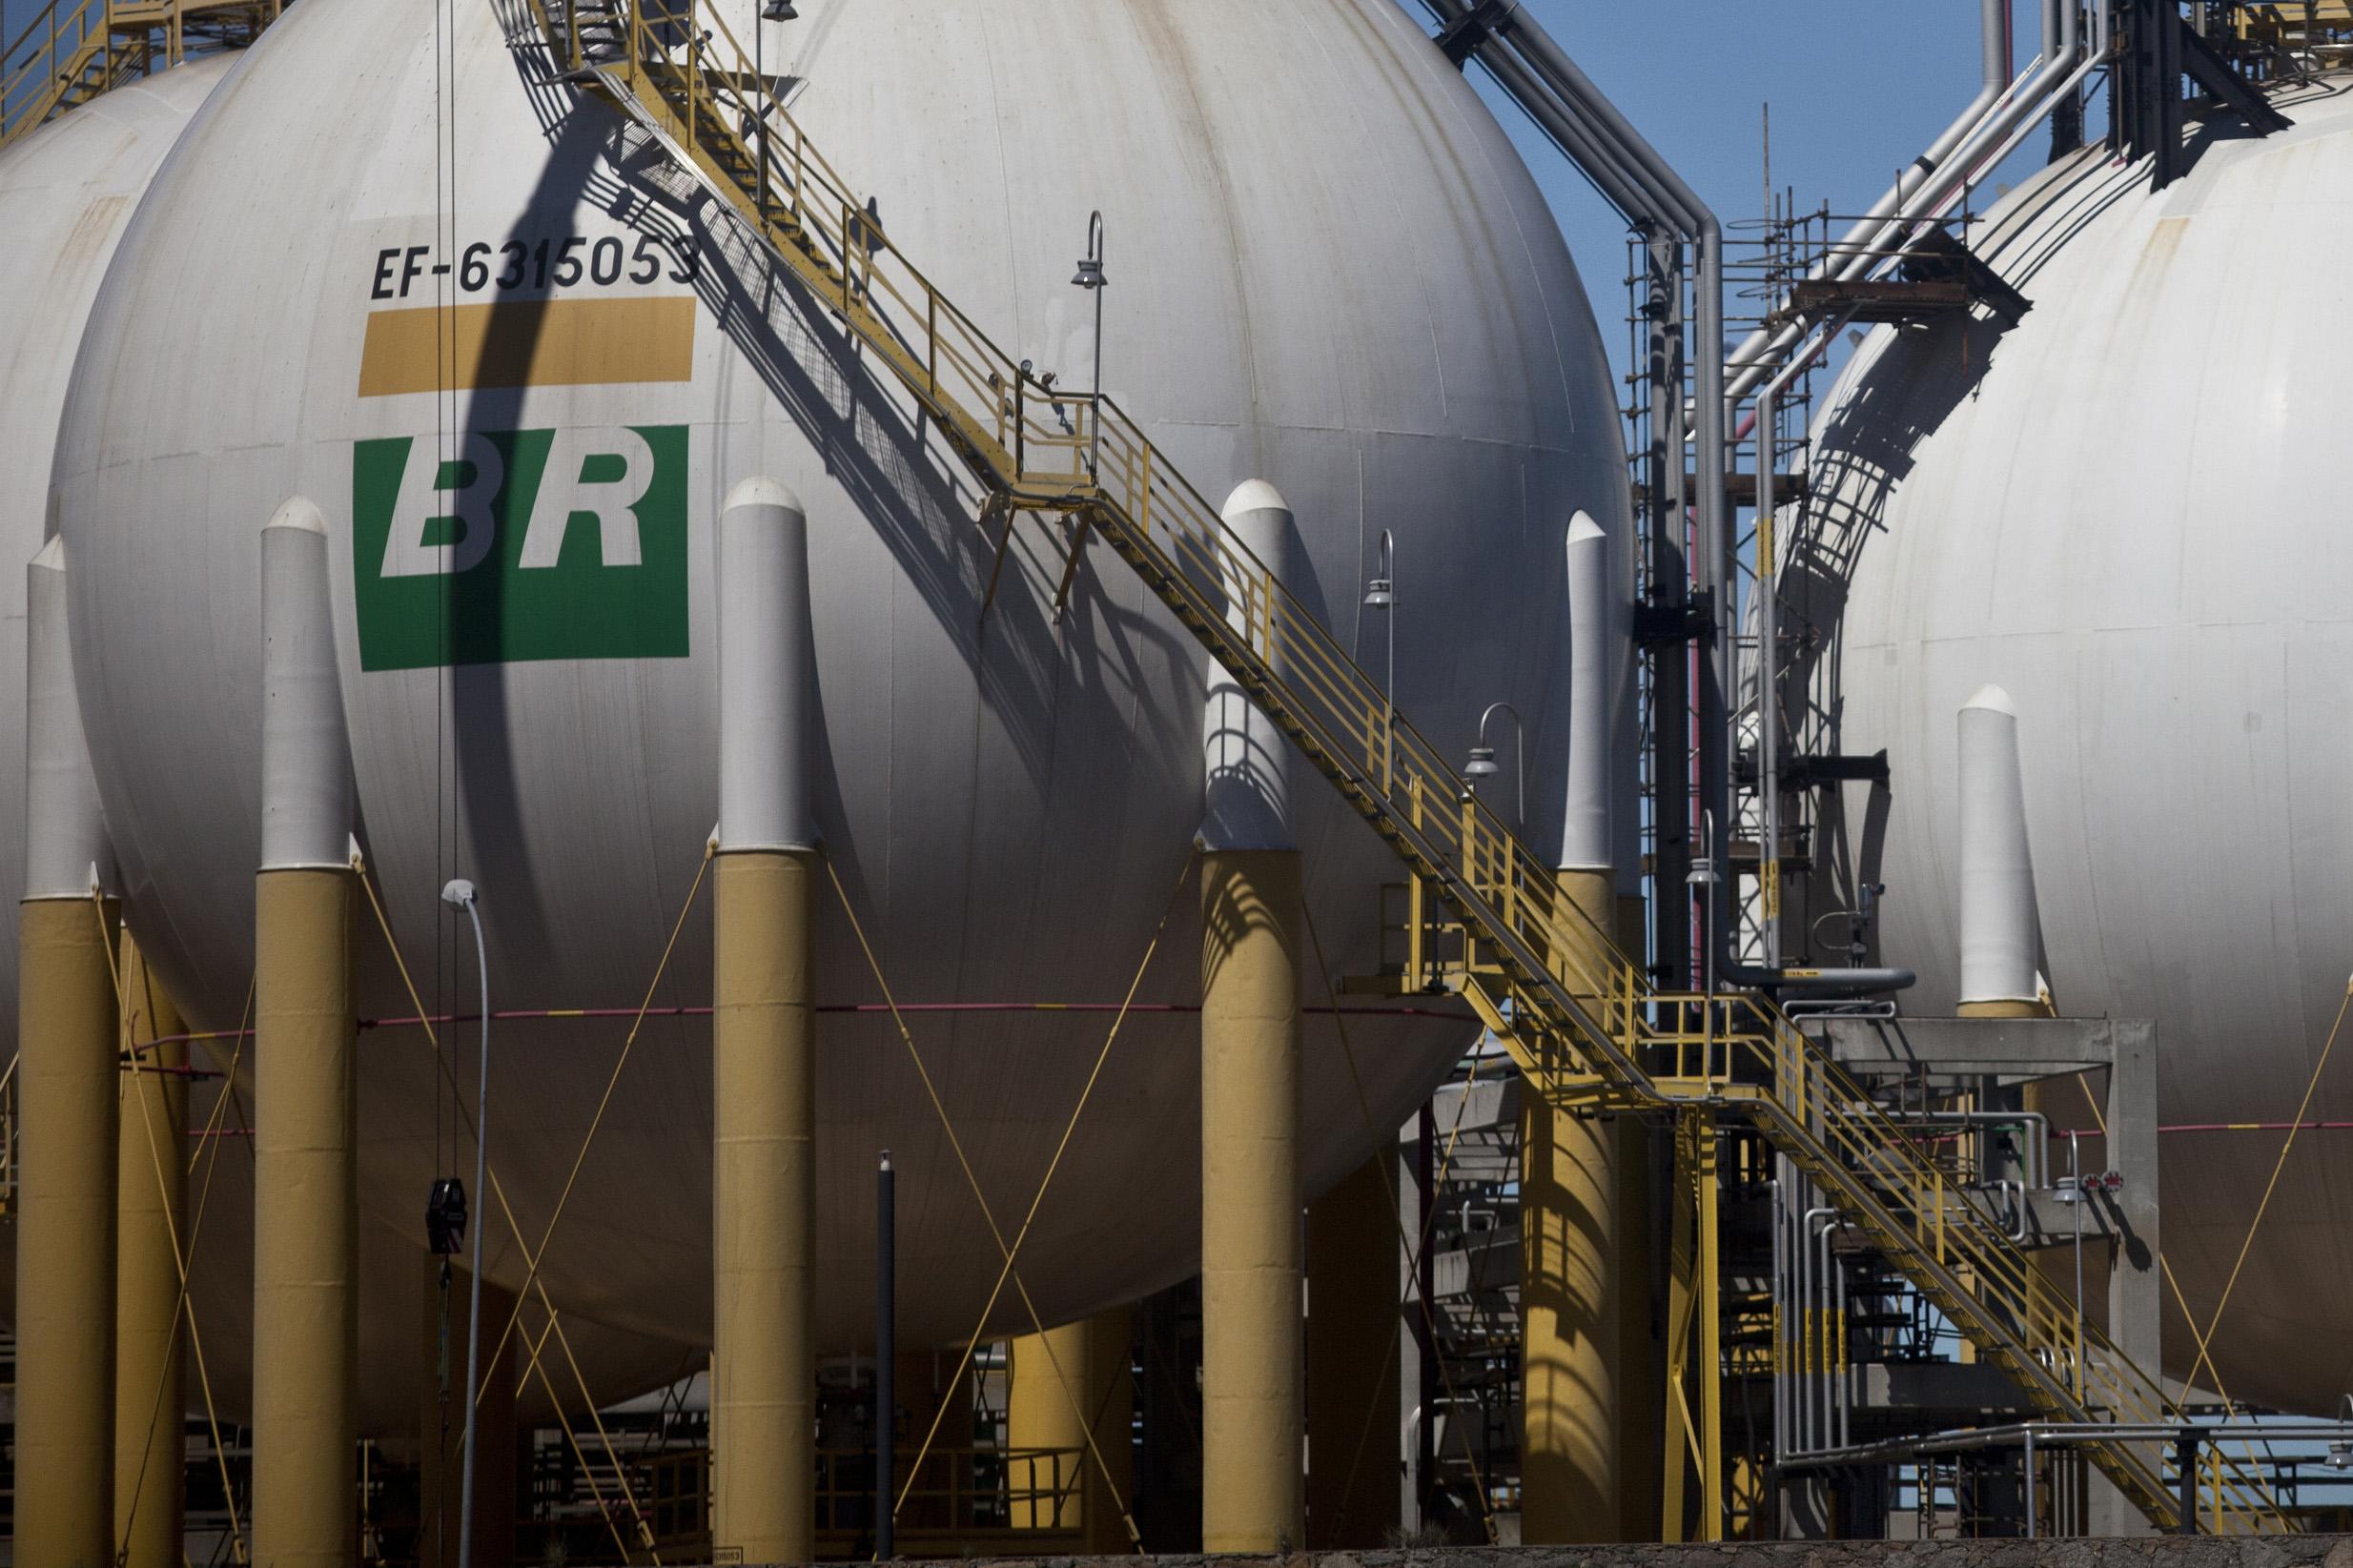 Pbr Stock Quote Petr4Bm&fbovespa Stock Quote  Petroleo Brasileiro Sa  Bloomberg